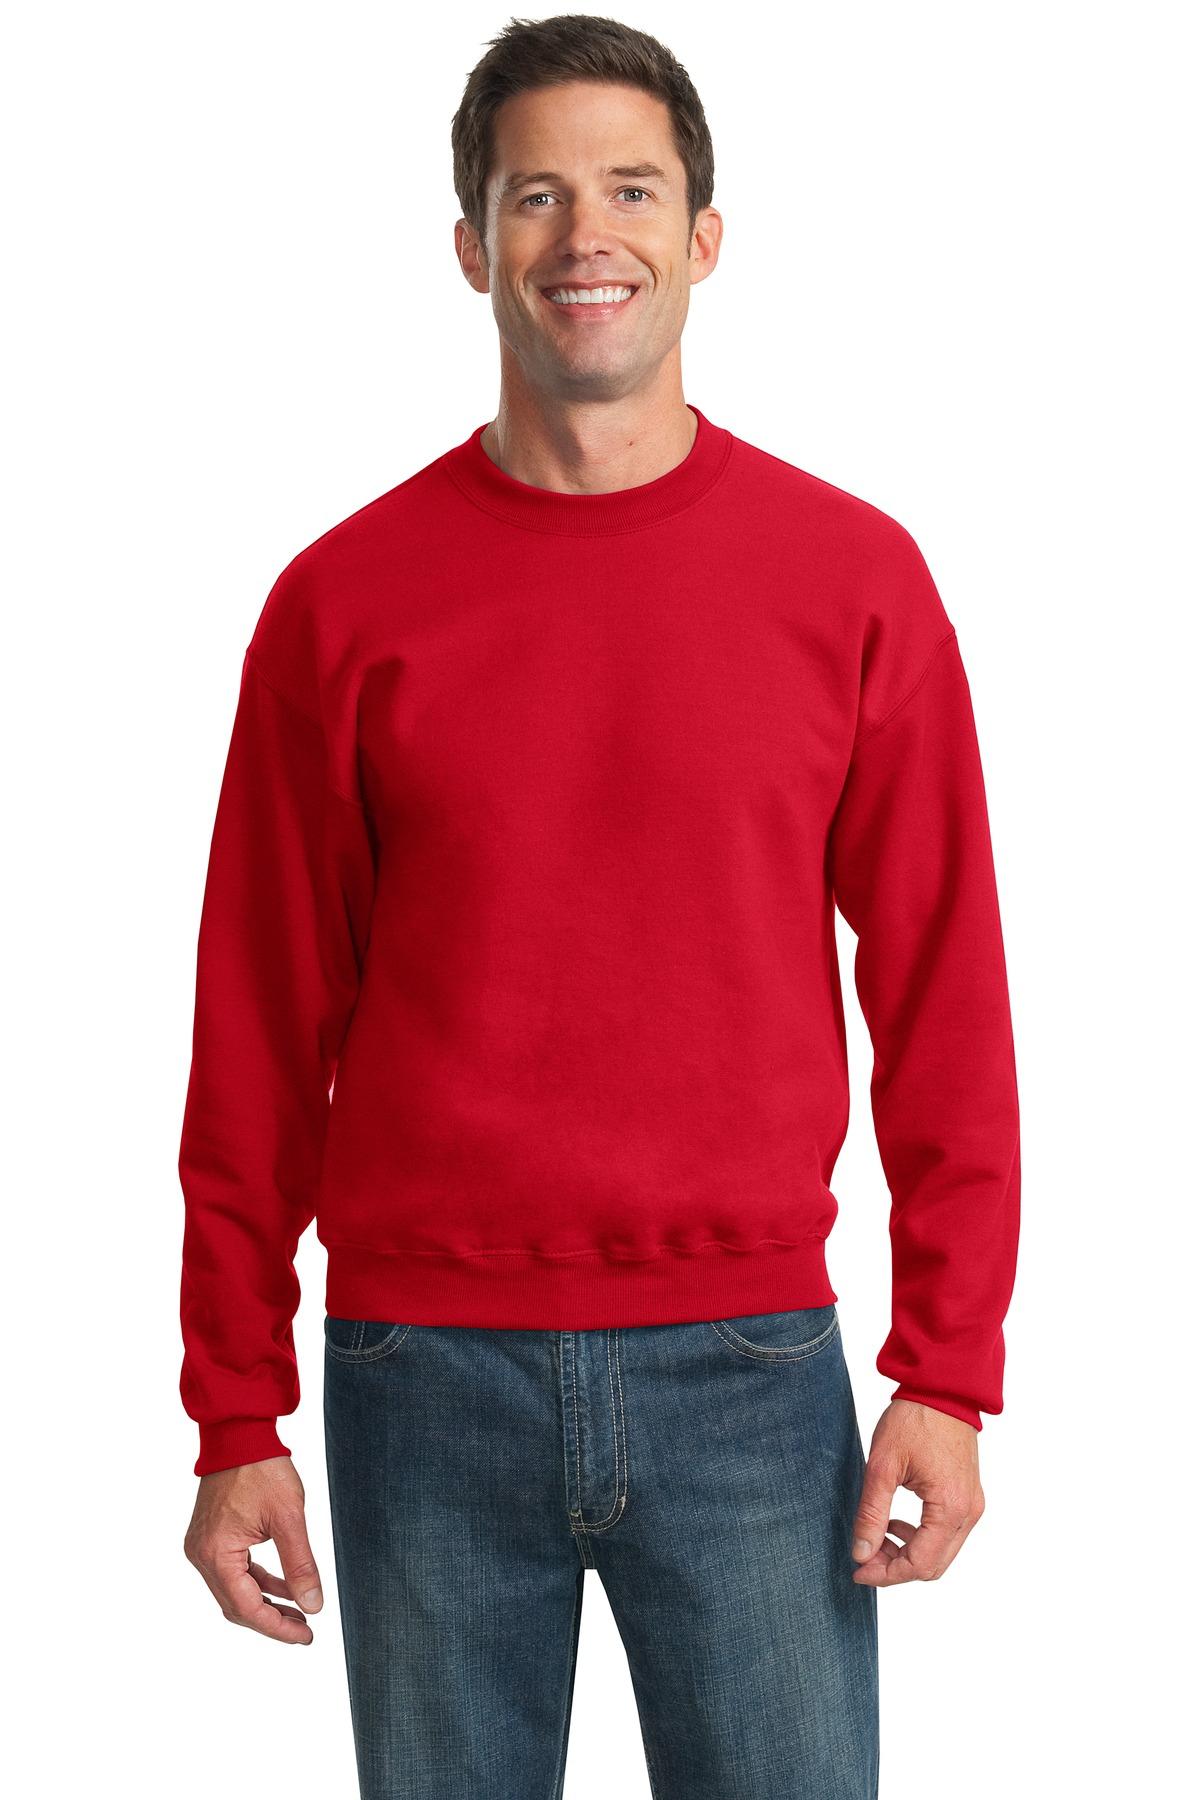 JERZEES - NuBlend Crewneck Sweatshirt. 562M